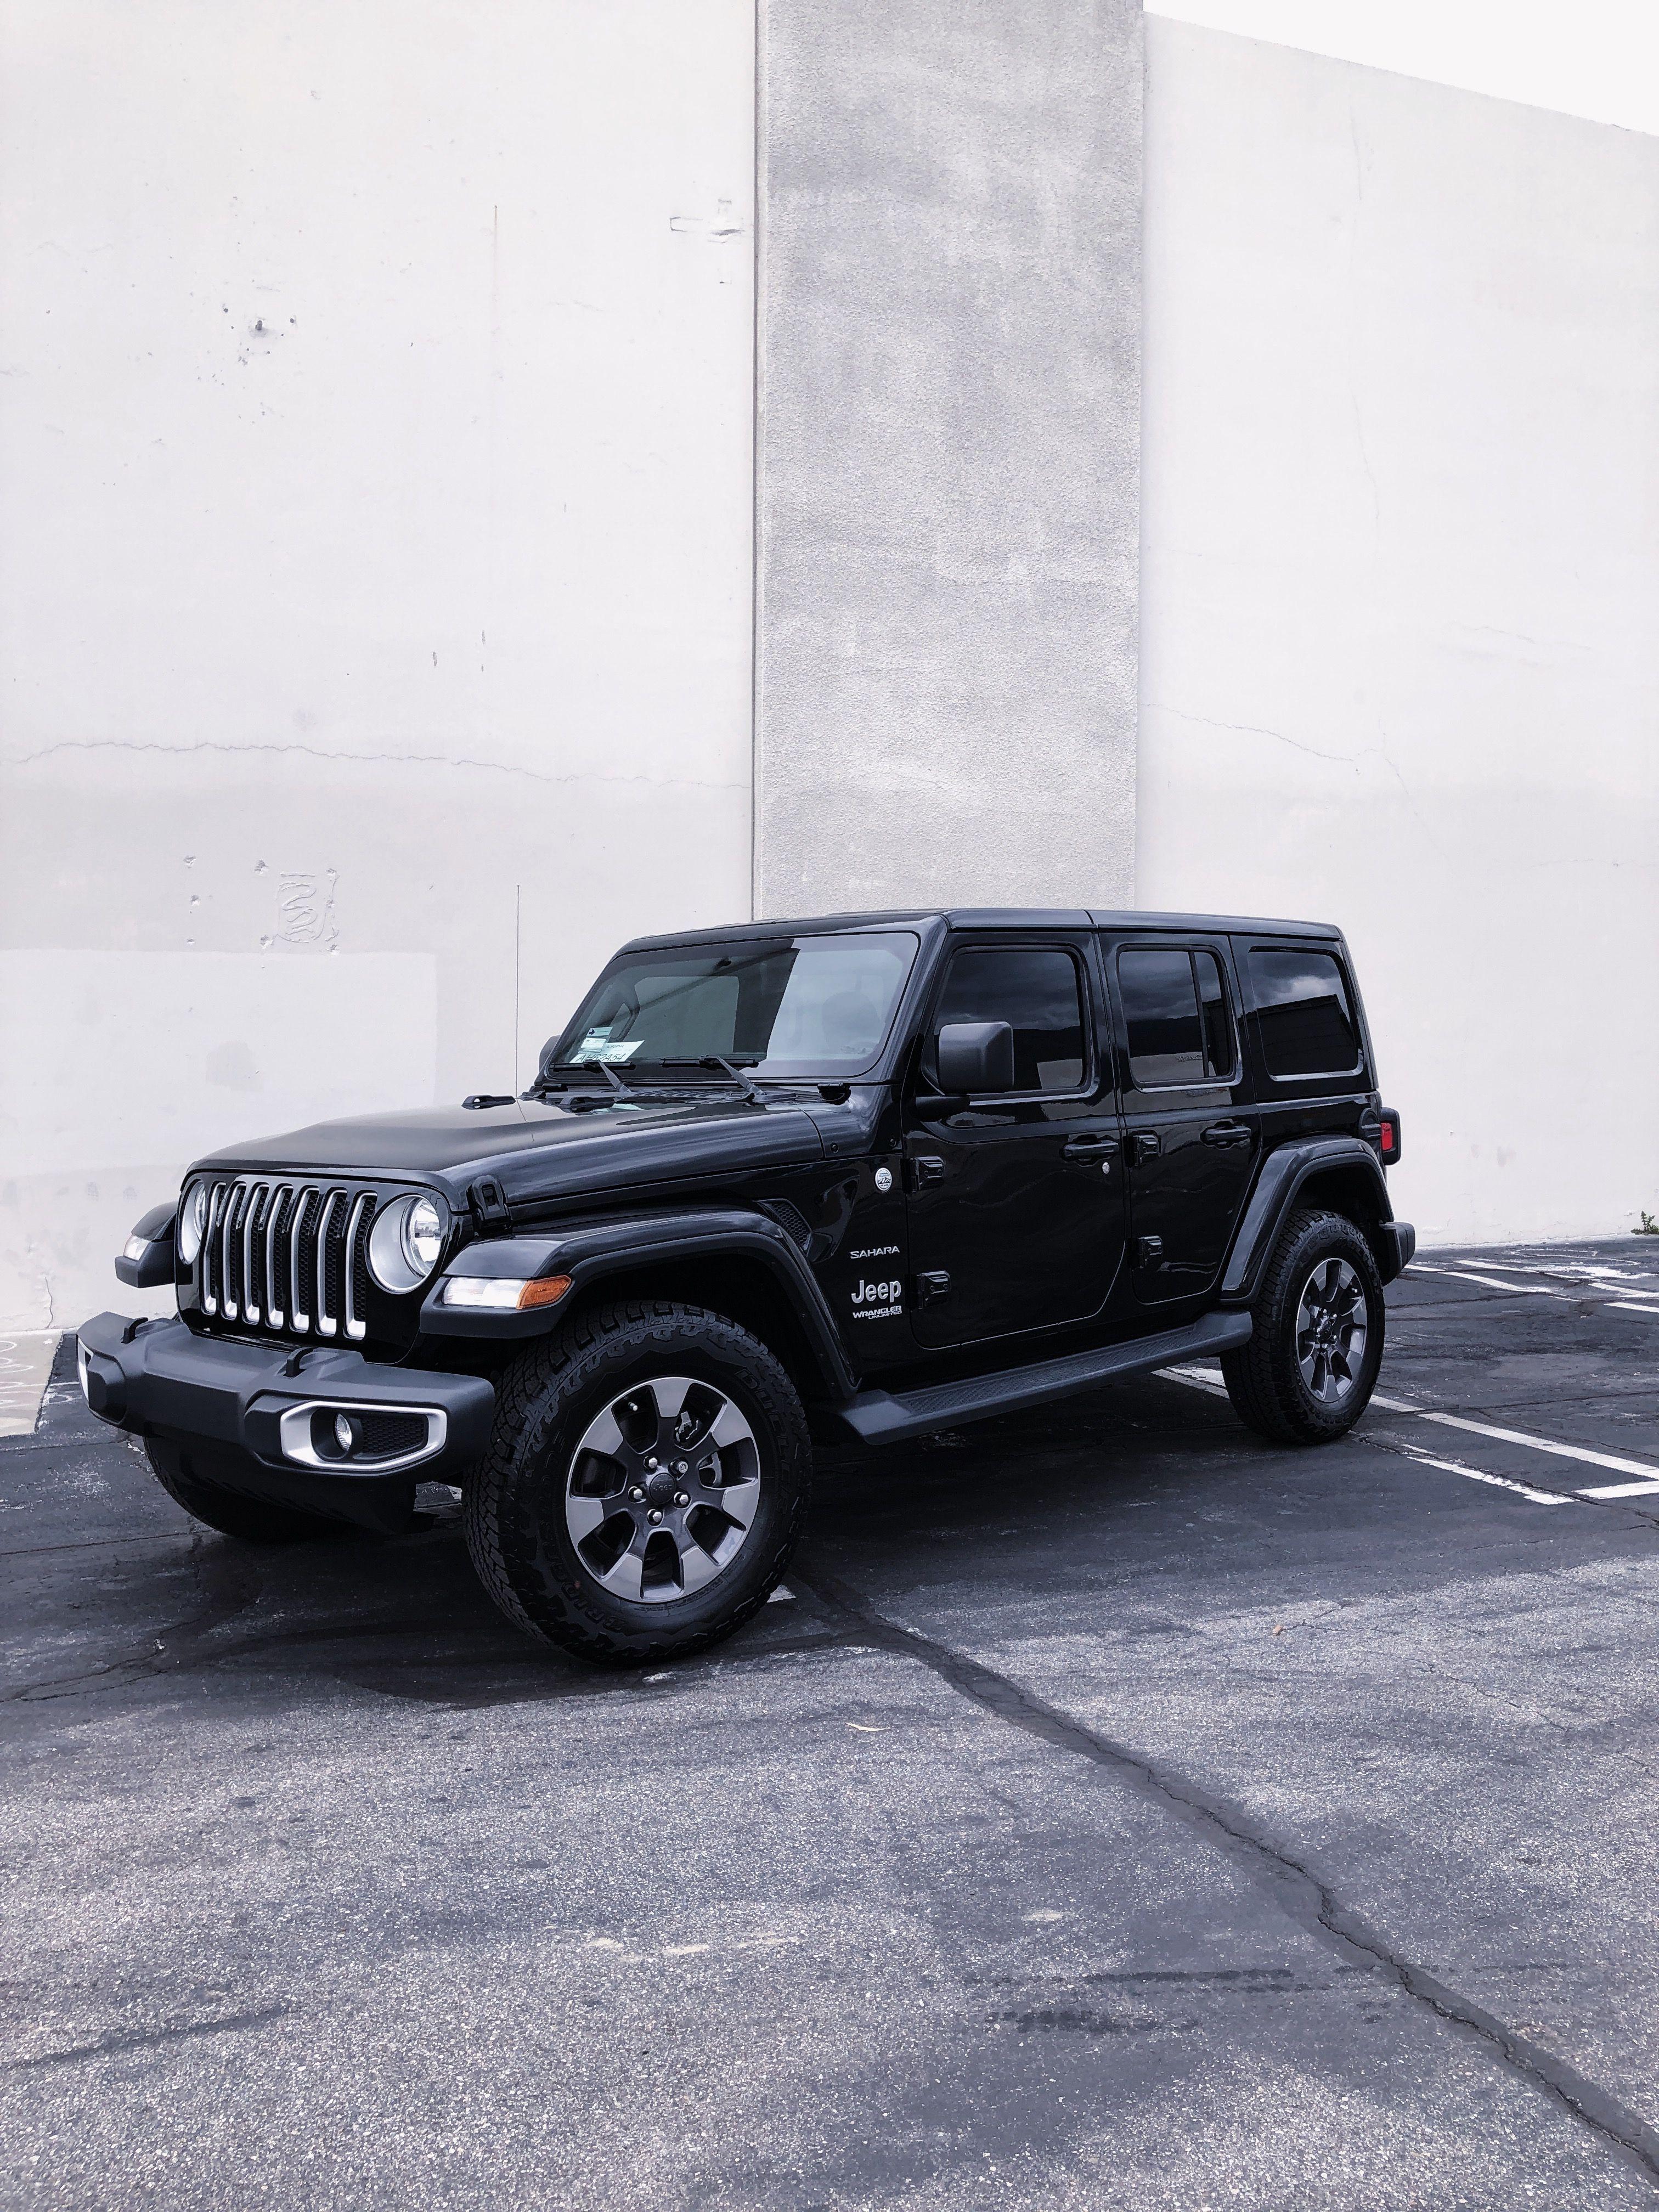 Black Jeep Wrangler Jl Sahara Cars Black Jeep Wrangler Jeep